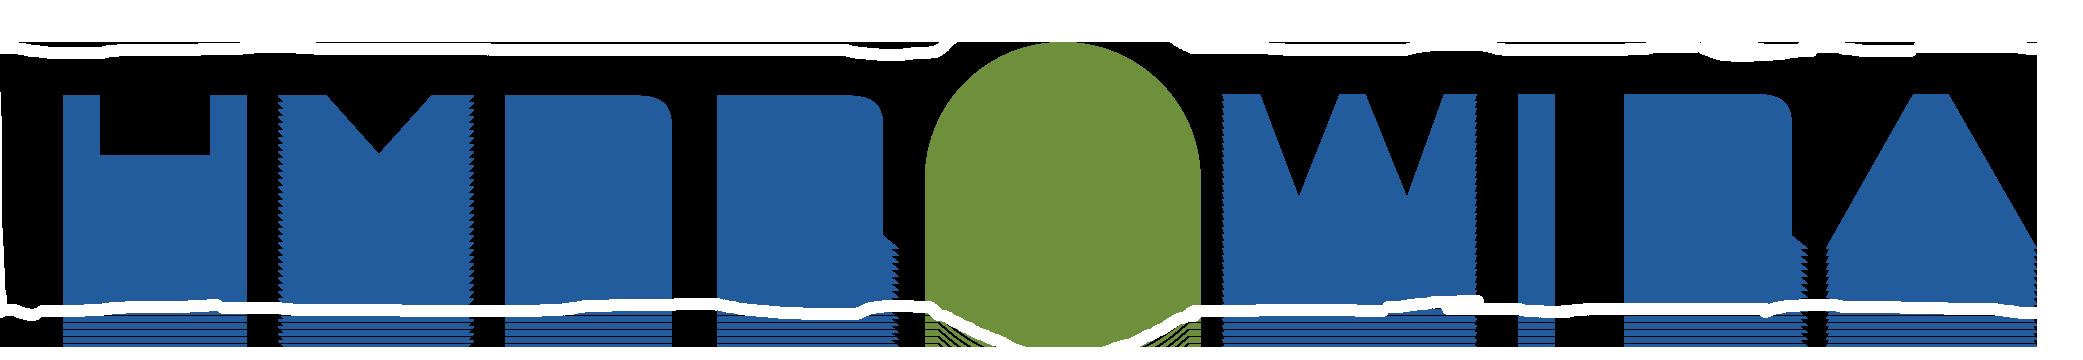 Hyprowira logo